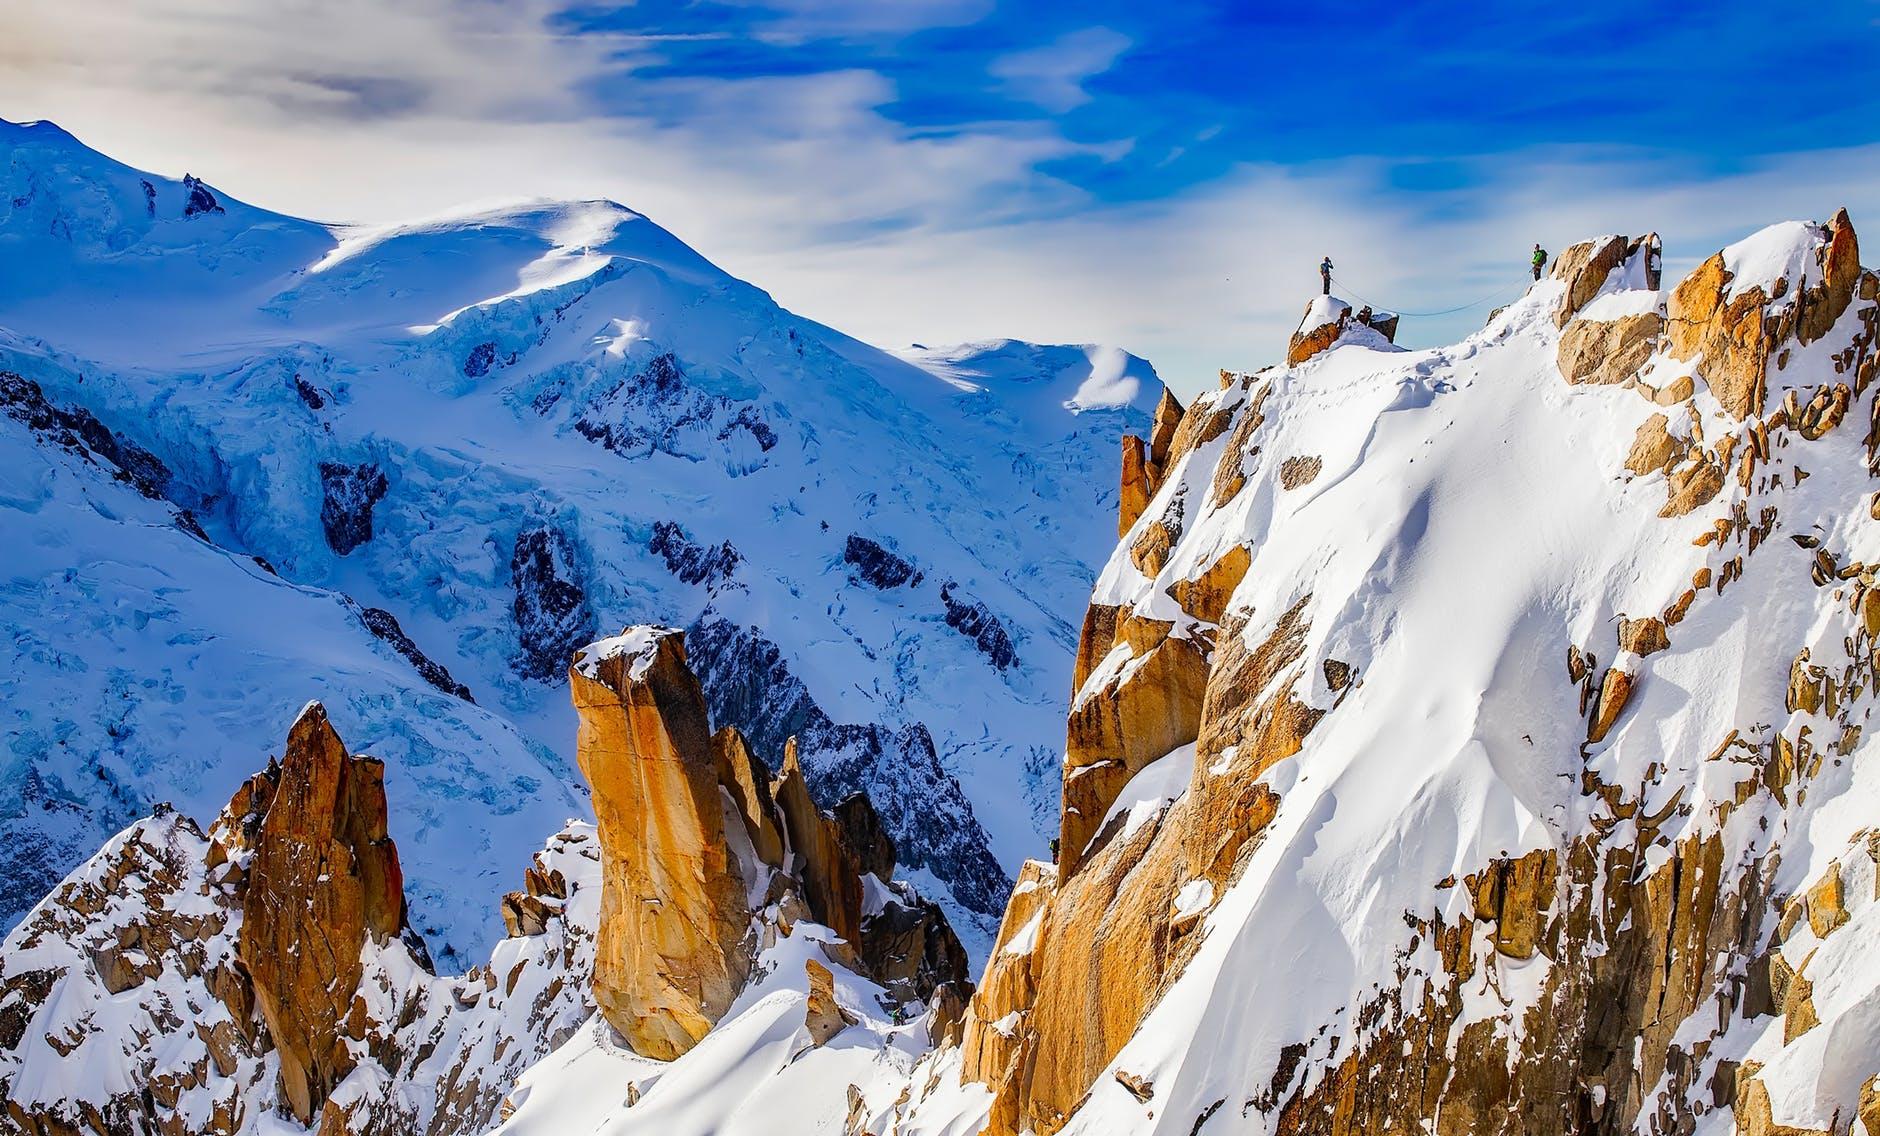 mountains-cosmiques-ridge-mountaineering-mountain-climbing-442403